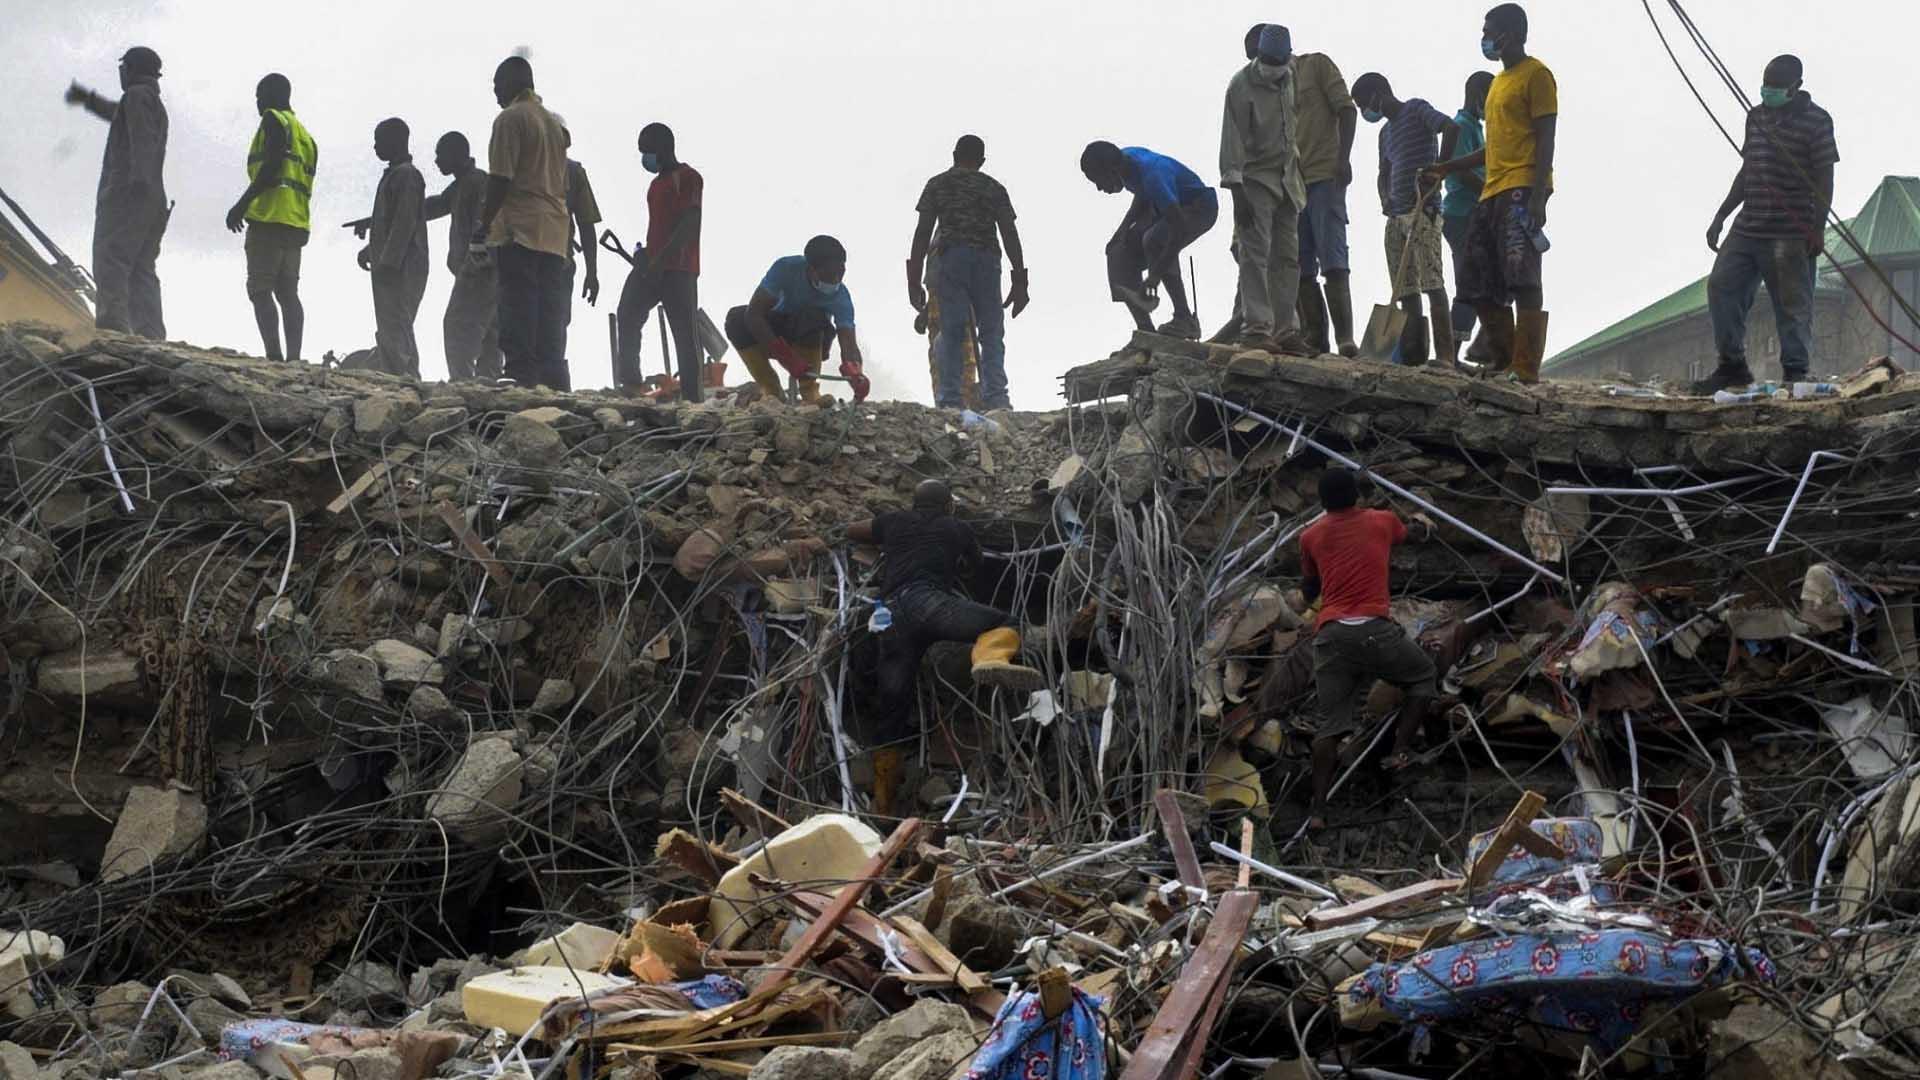 Las autoridades paralizaron otras 20 obras consideradas peligrosas